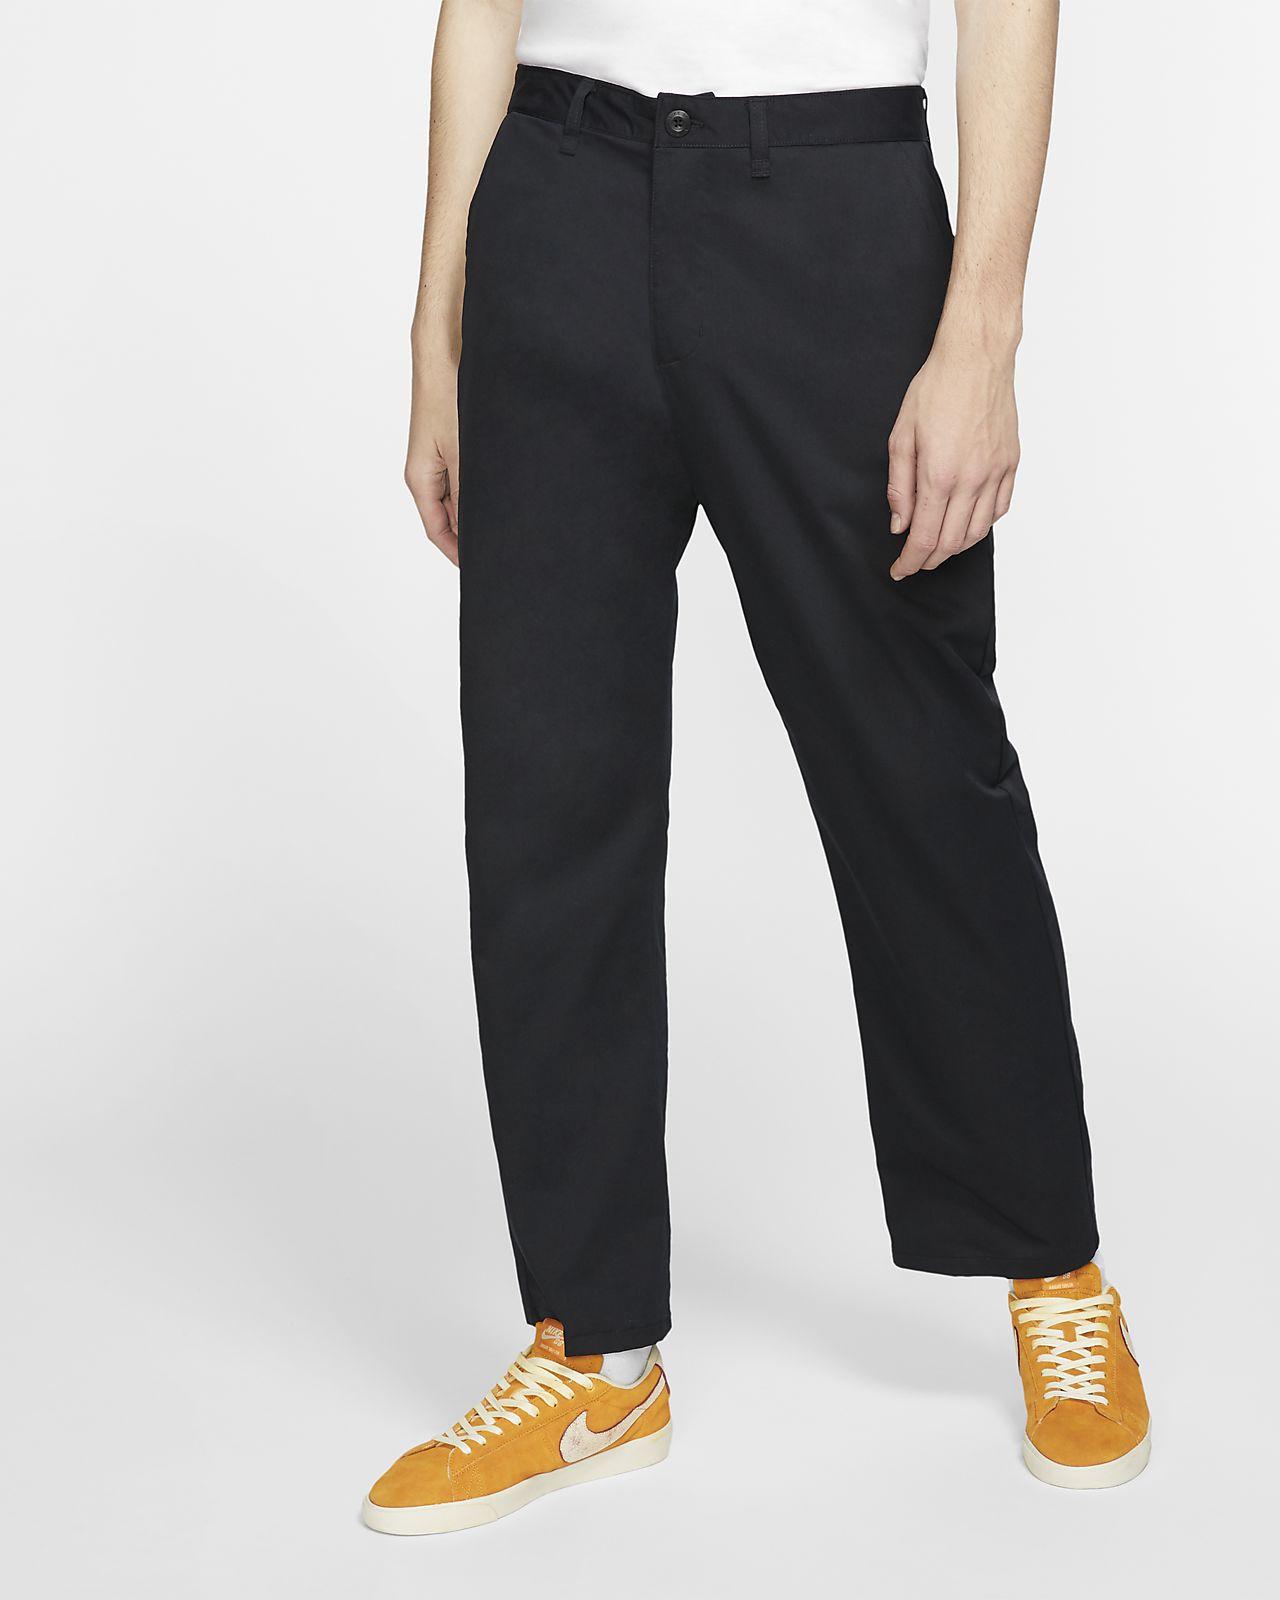 Pantalon coupe ample Nike SB Dri-FIT FTM pour Homme